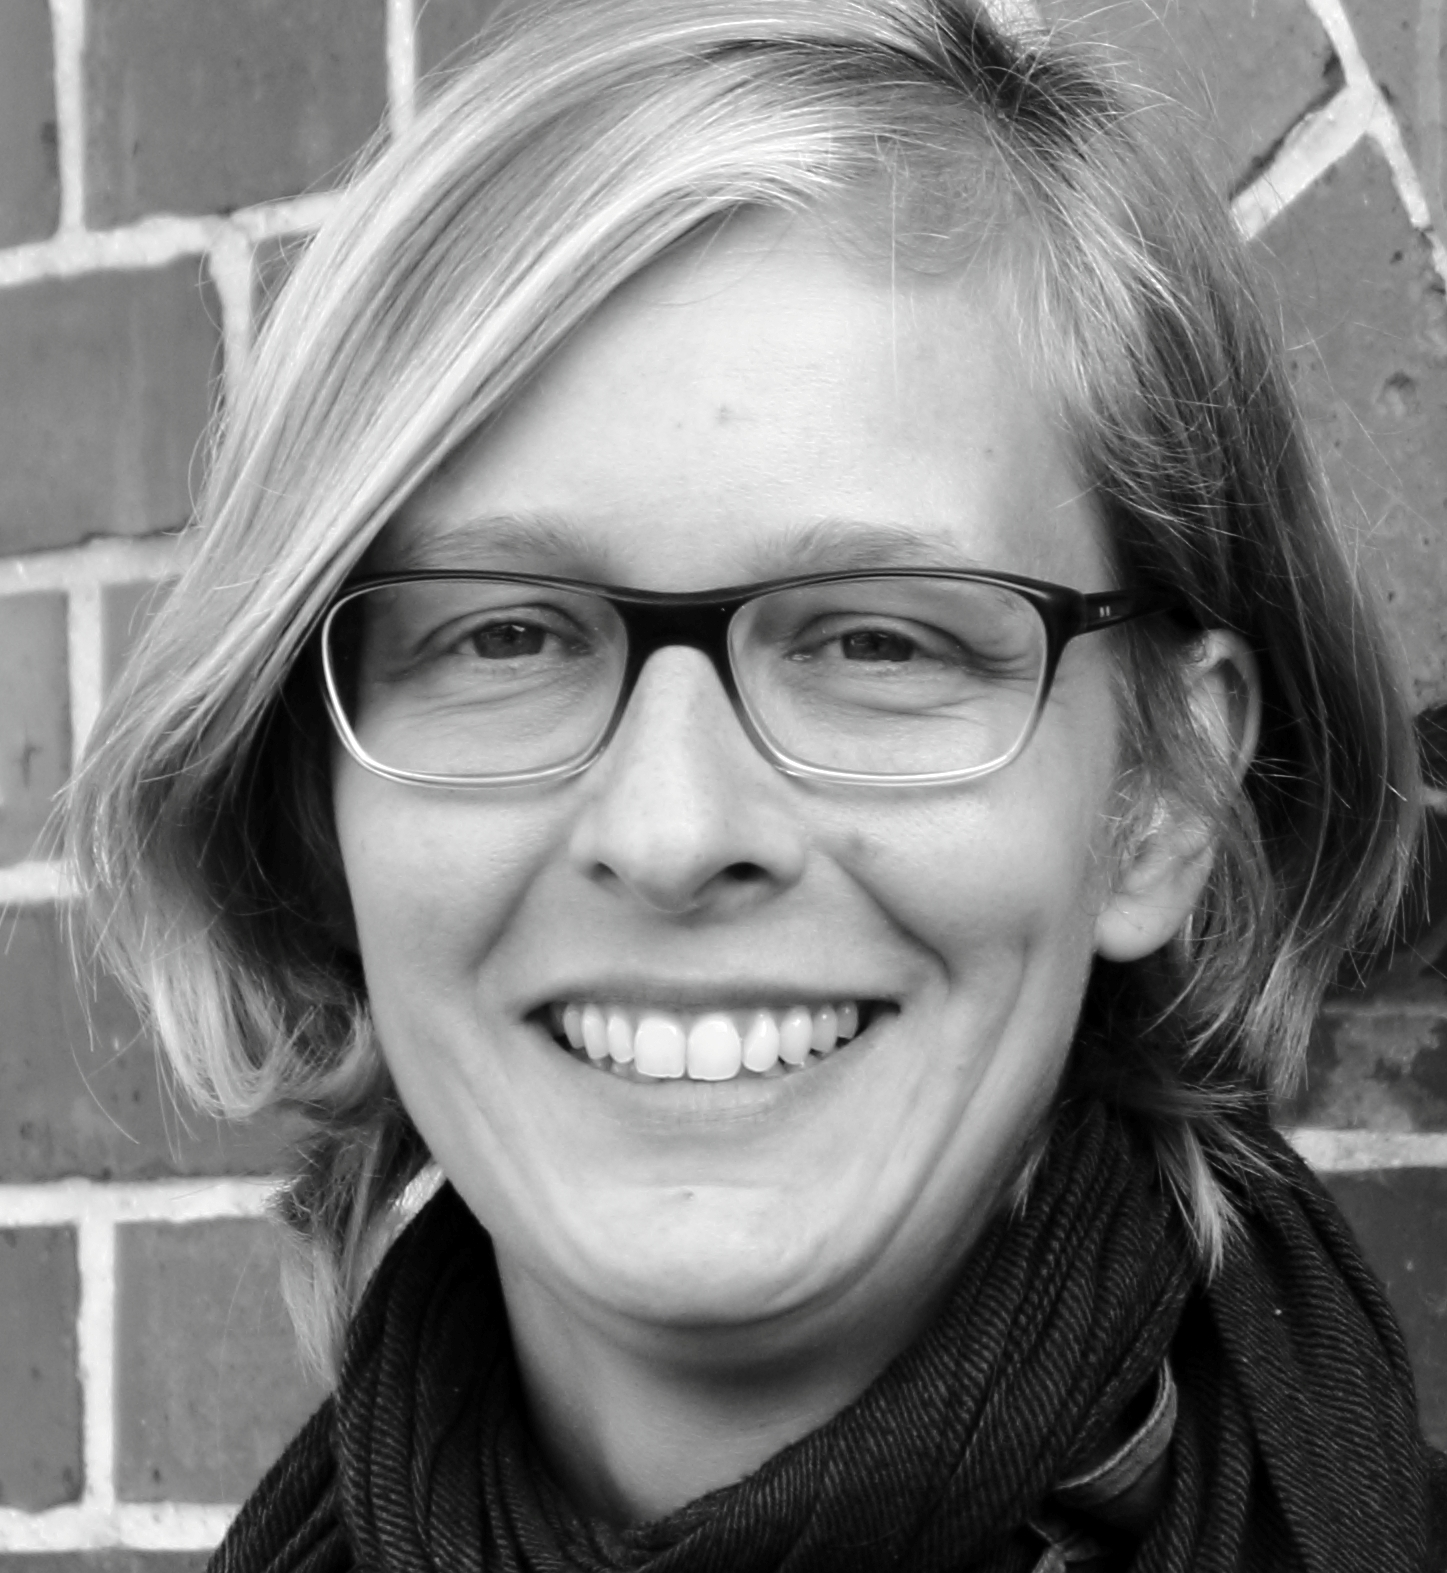 Dr.-Ing. Myriam Lipprandt